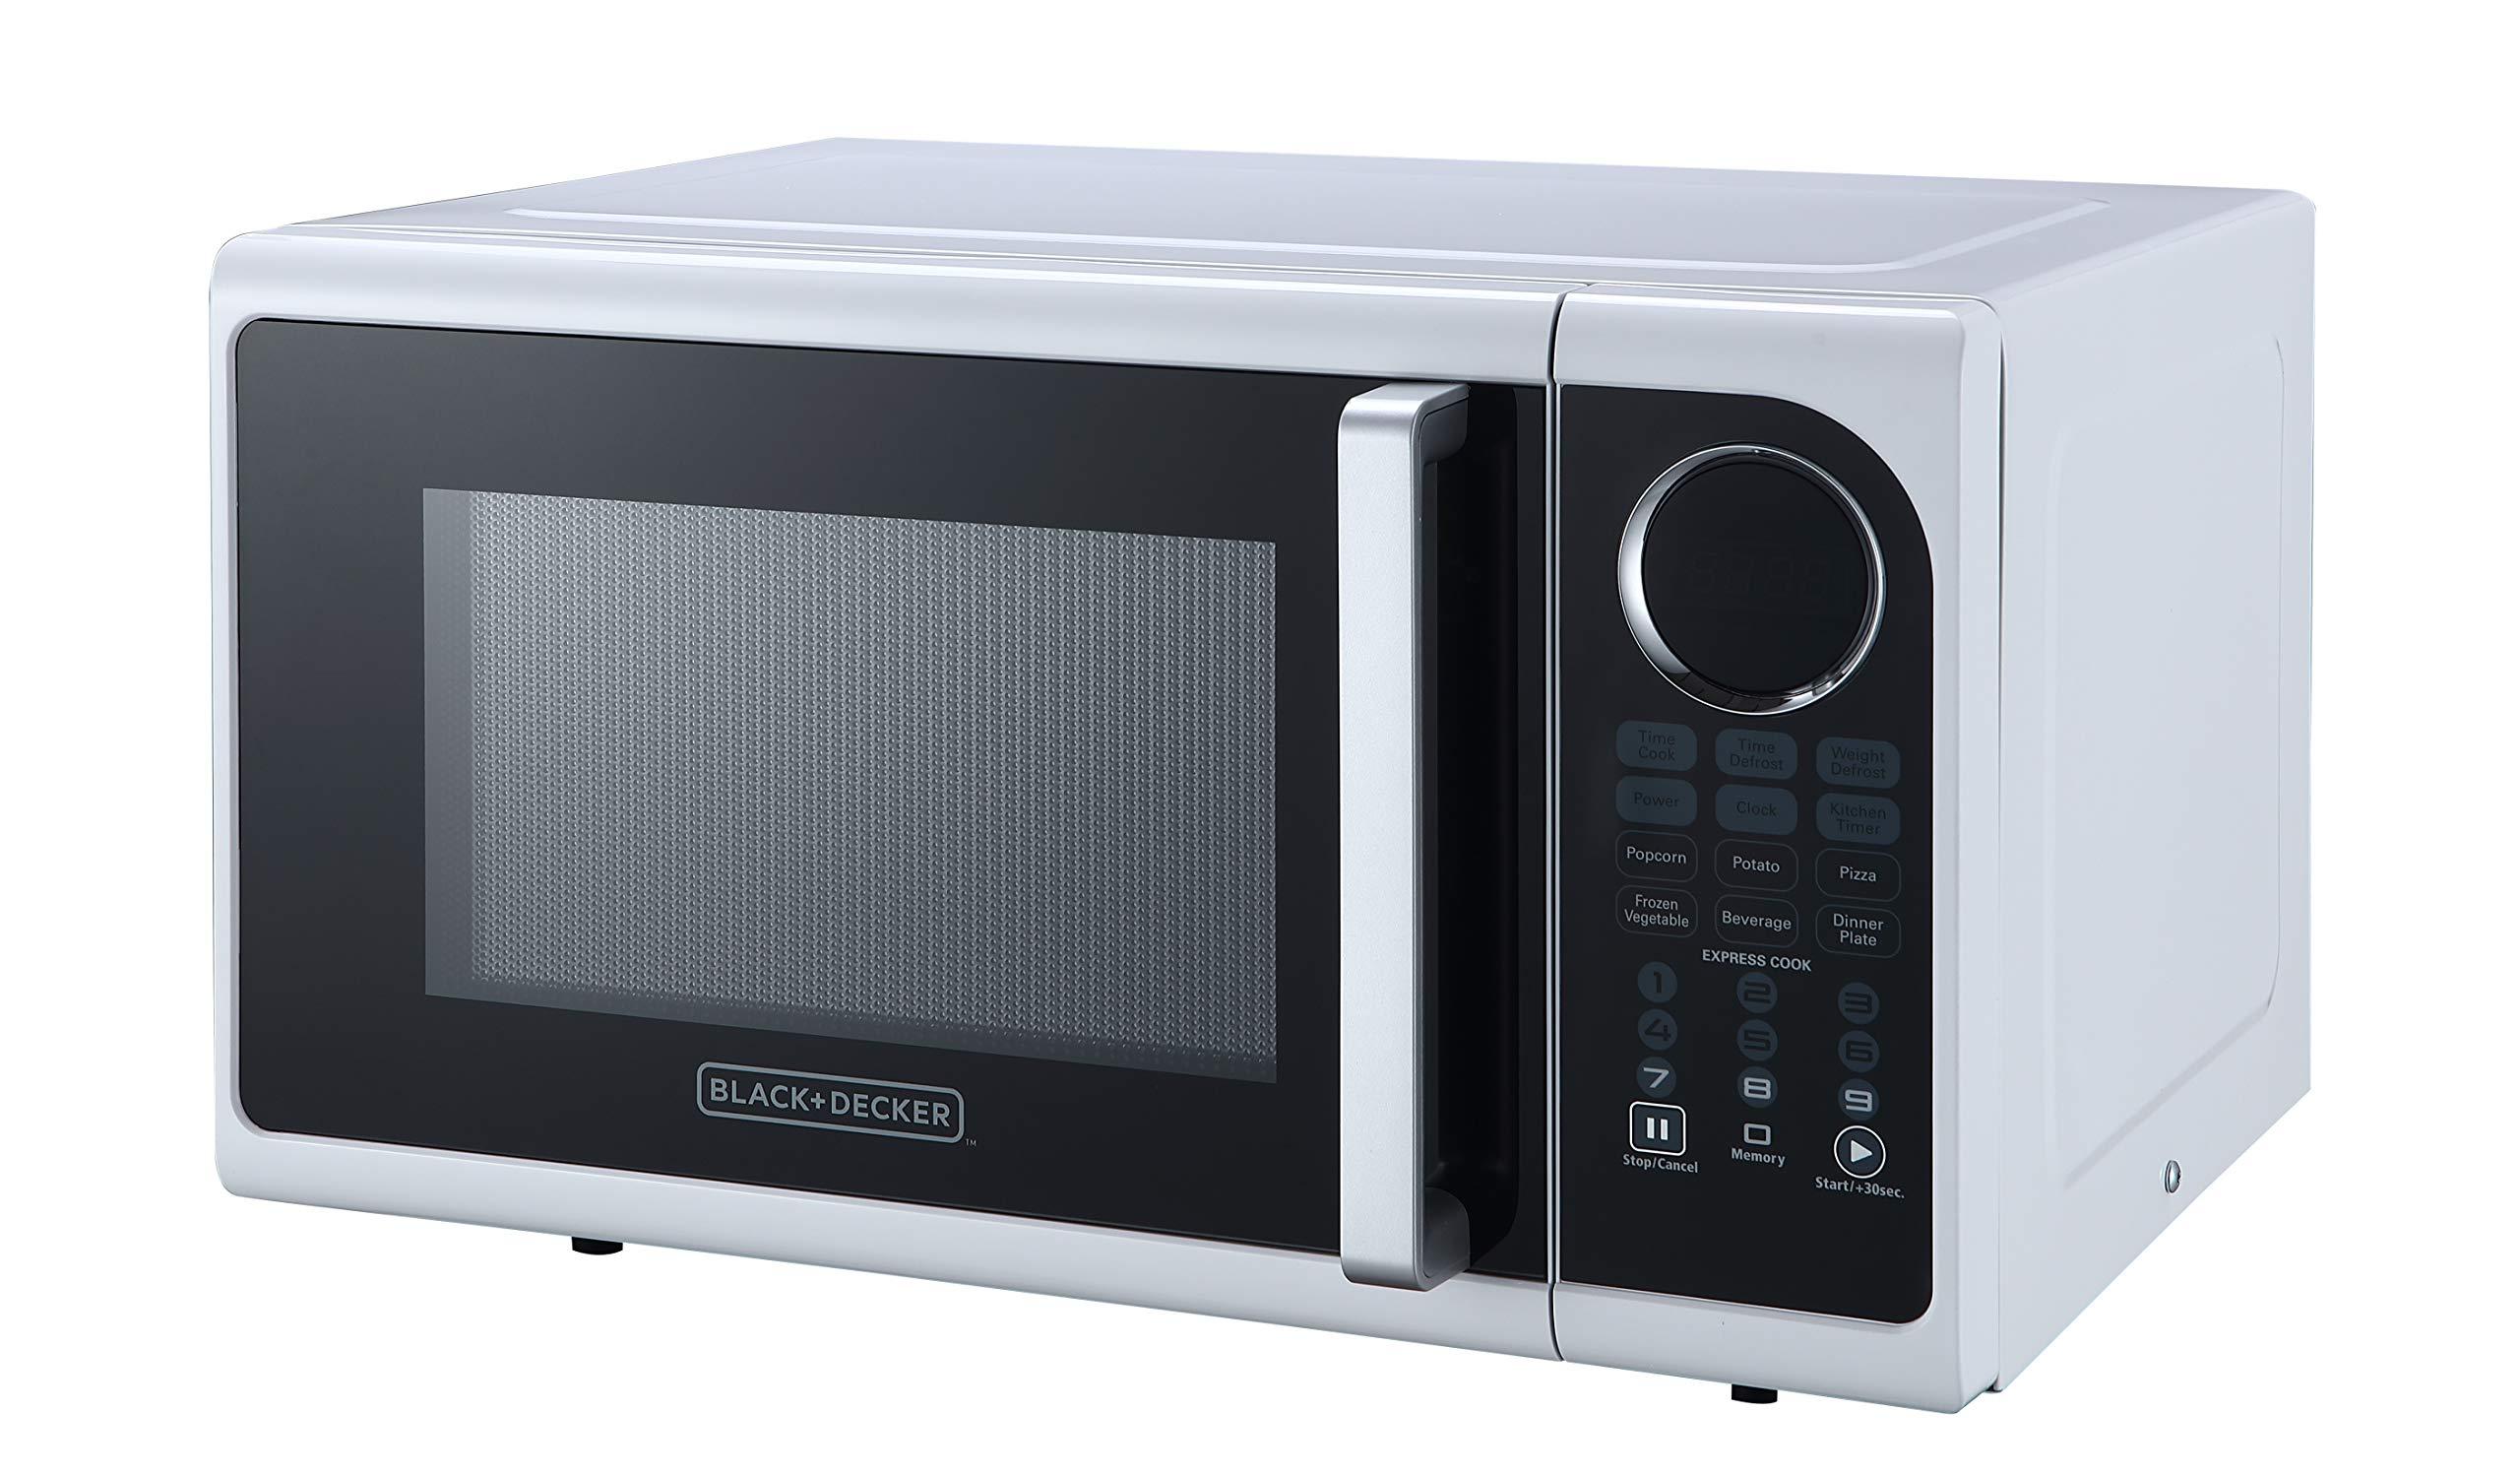 Black+Decker EM925ACP-P1 0.9 Cu. Ft. Digital Microwave, White by BLACK+DECKER (Image #3)